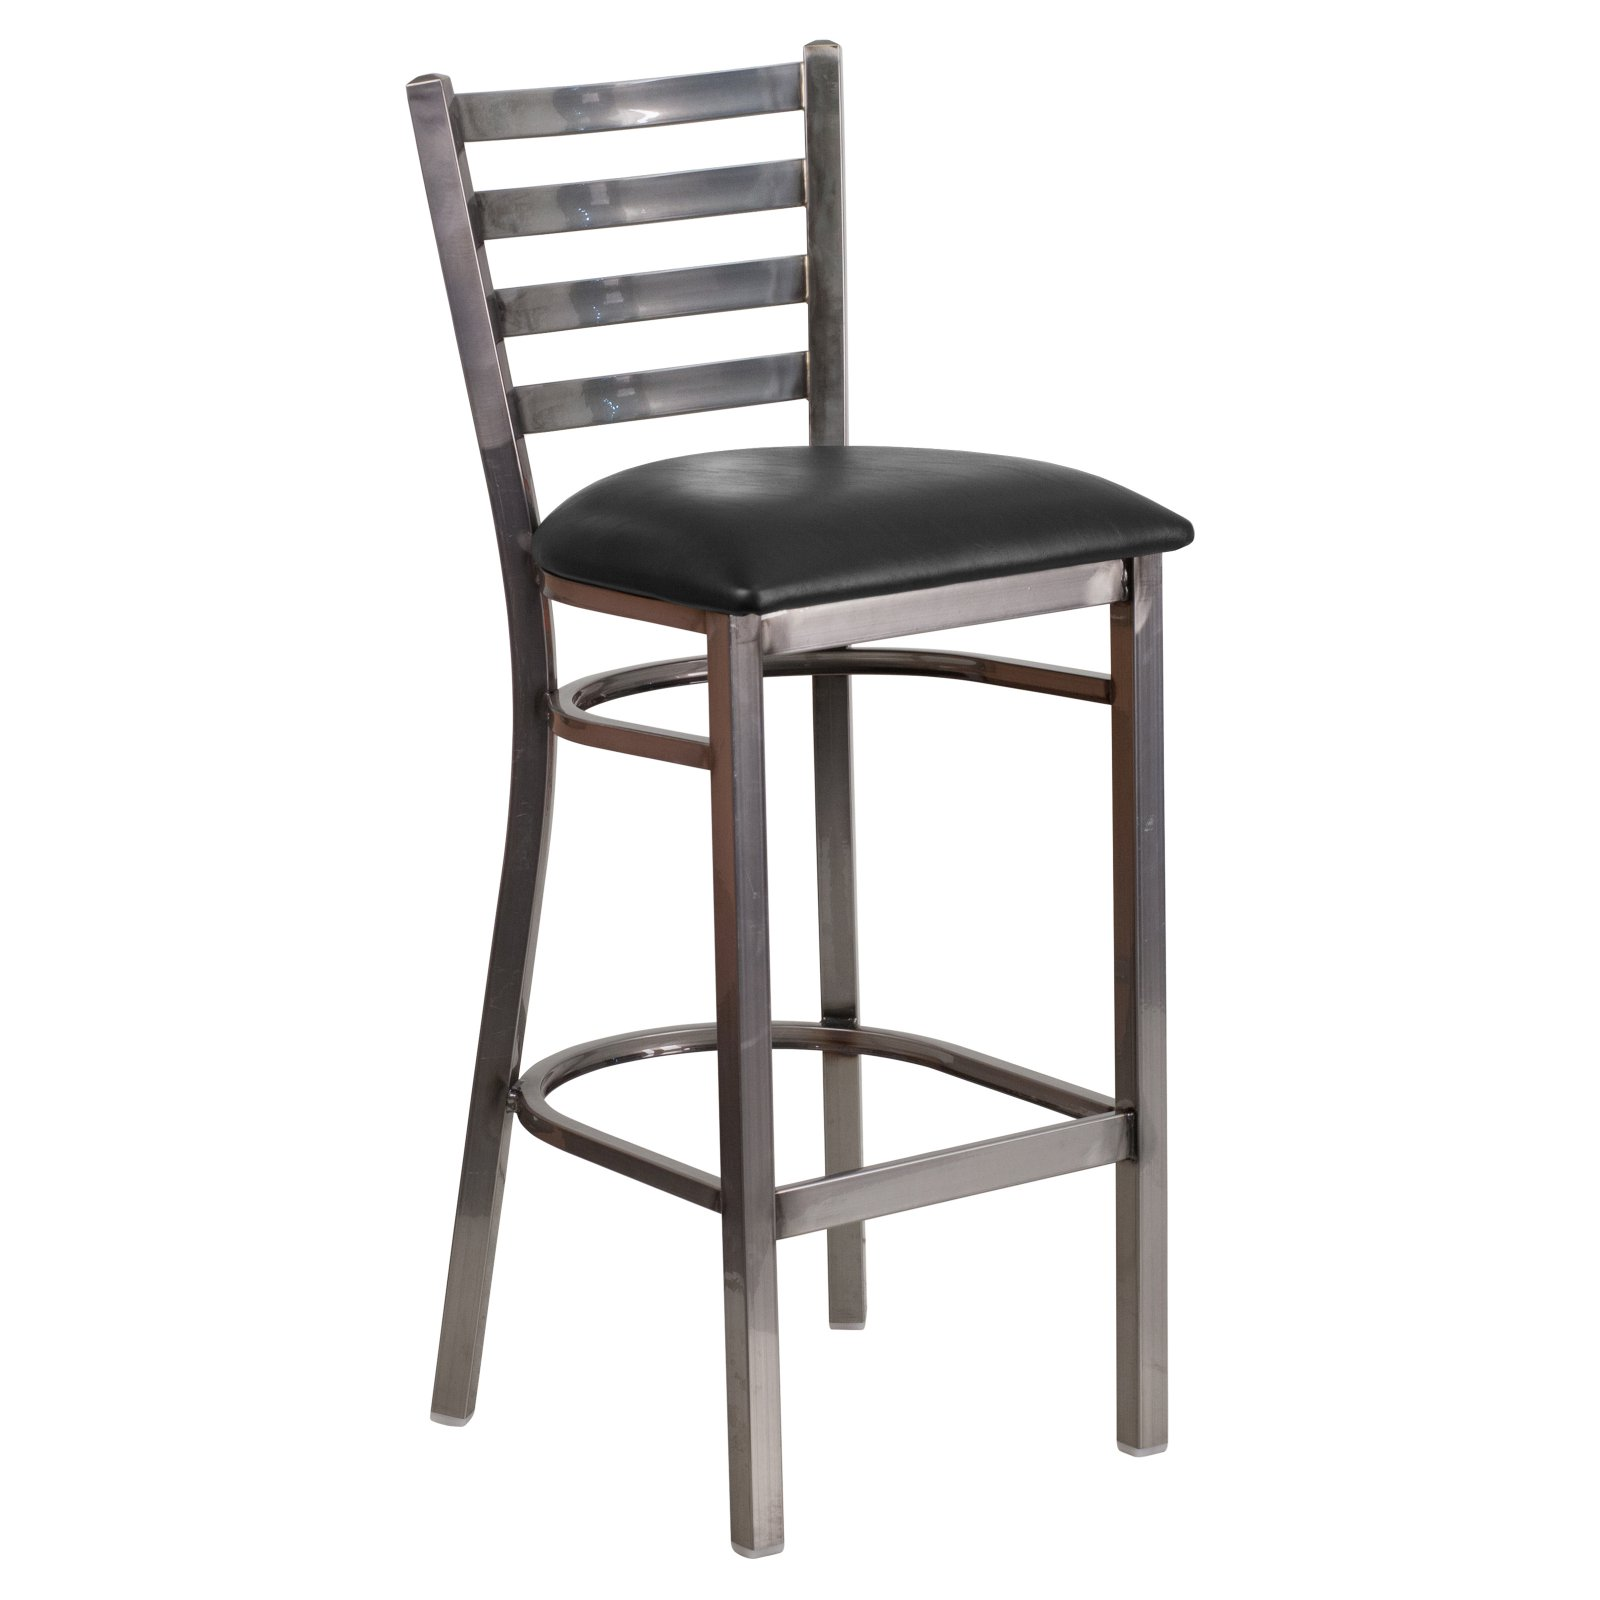 Flash Furniture HERCULES Series Clear Coated Ladder Back Metal Restaurant Barstool, Vinyl Seat, Multiple Colors